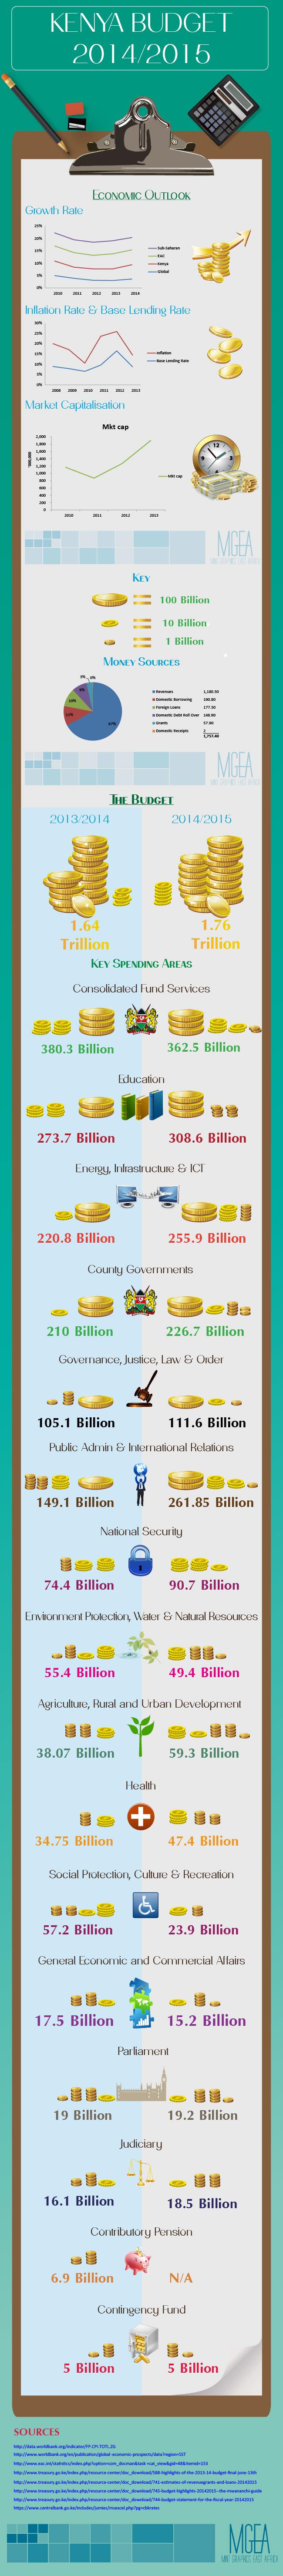 Kenya Budget 2014/2015